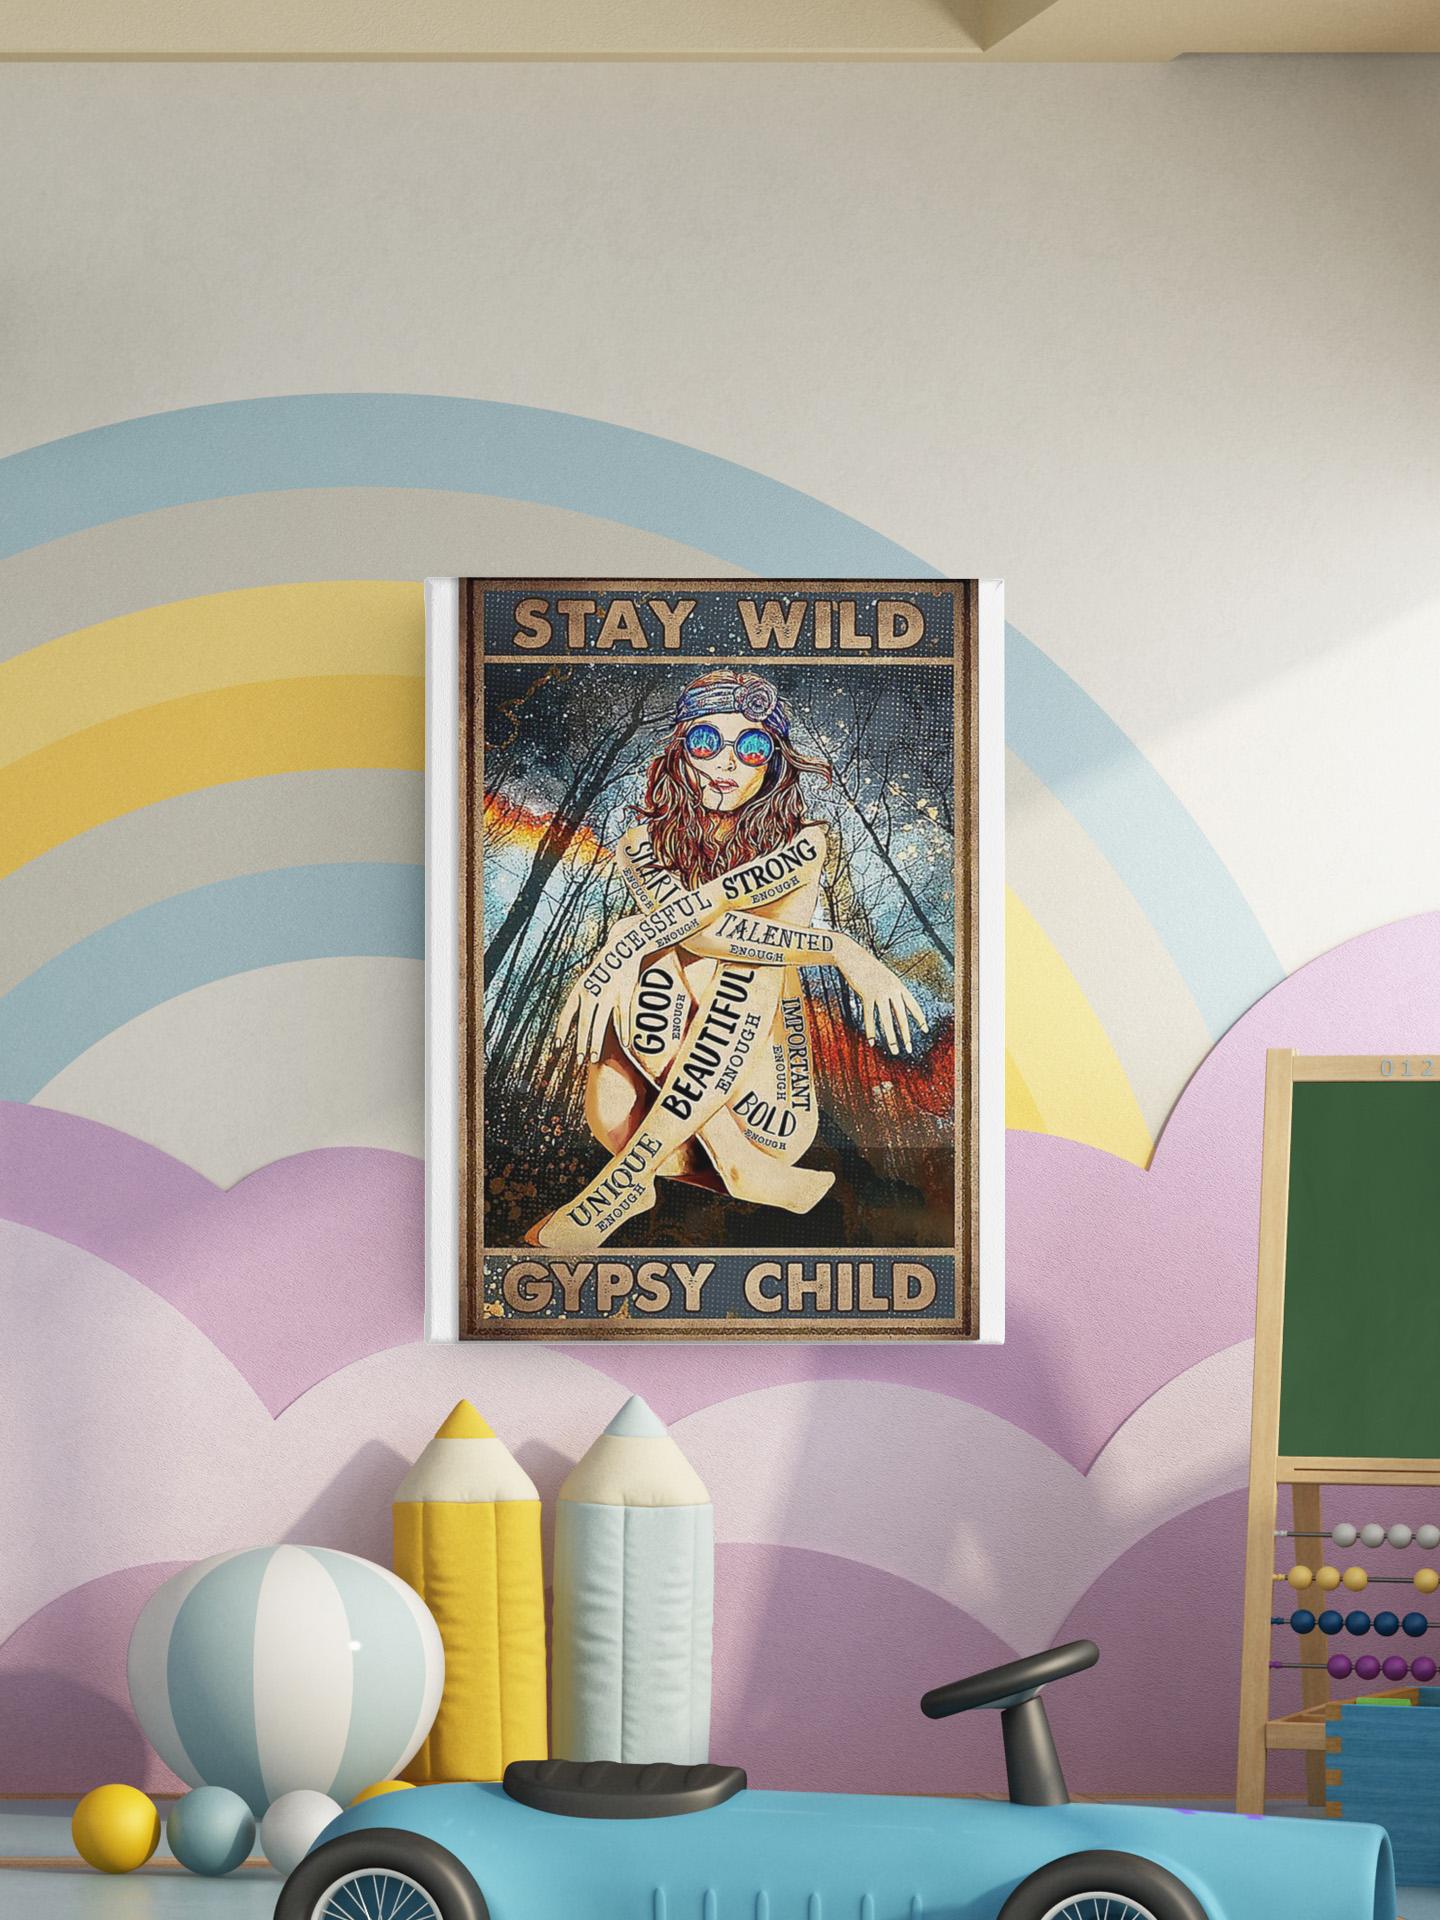 Hippie stay wild gypsy child poster